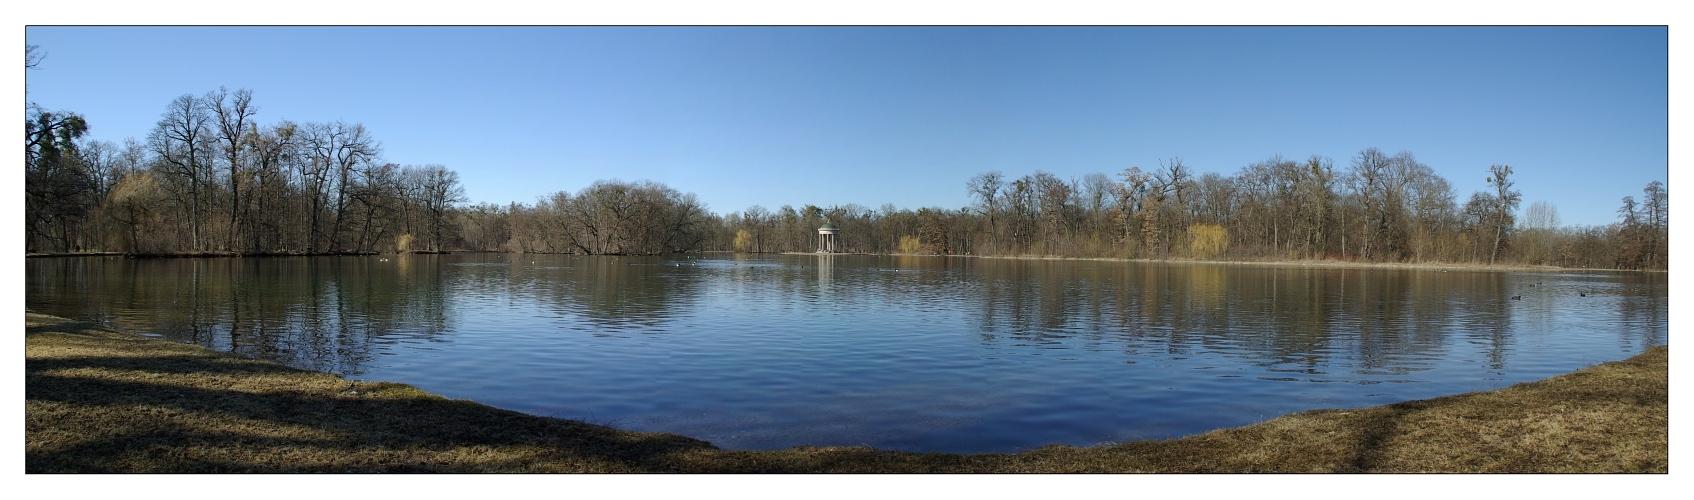 Nymphenburger Park